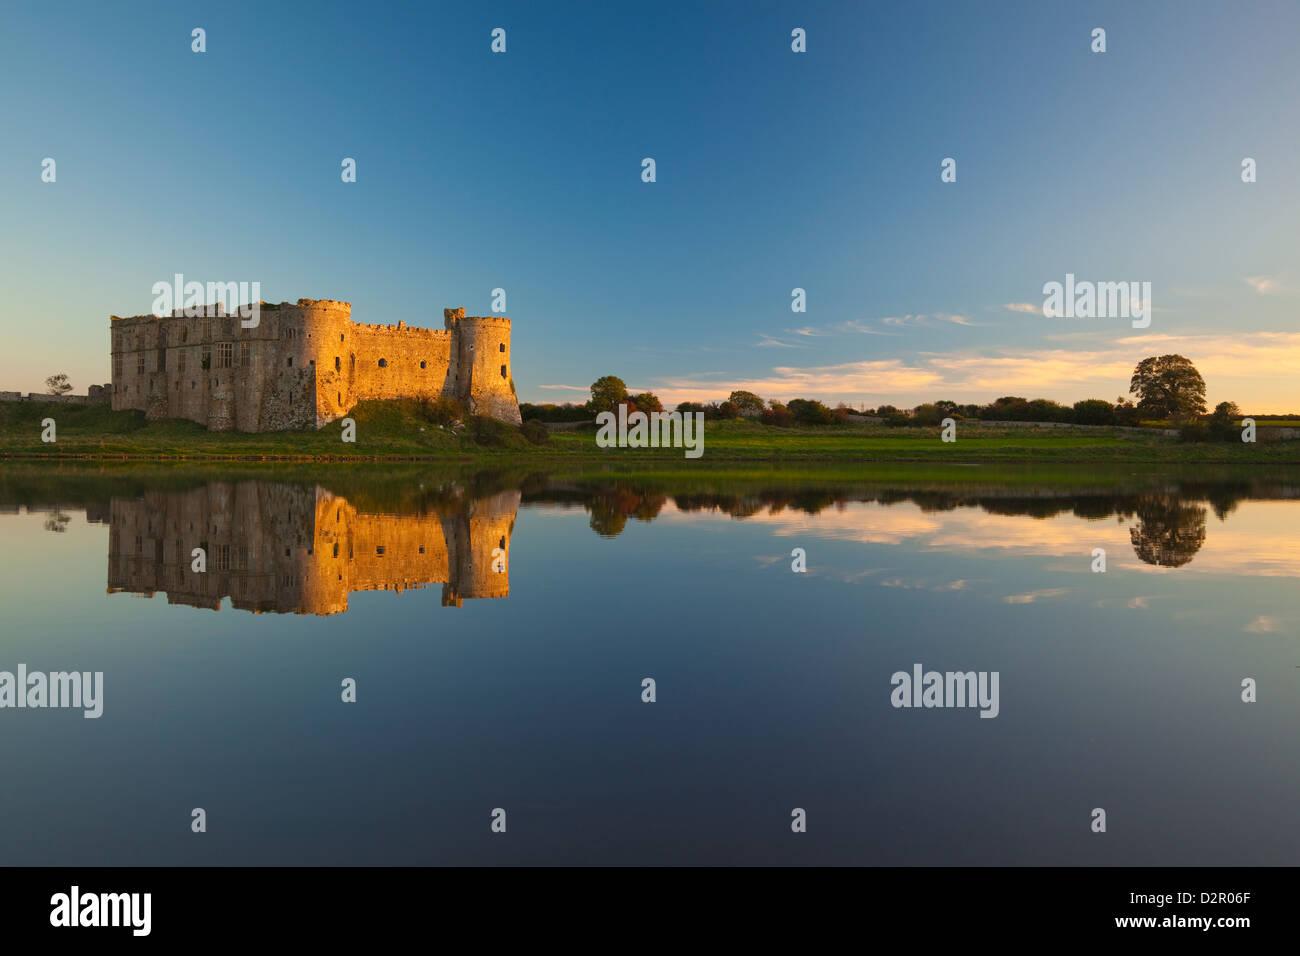 Carew Castle, Pembrokeshire, Wales, United Kingdom, Europe - Stock Image